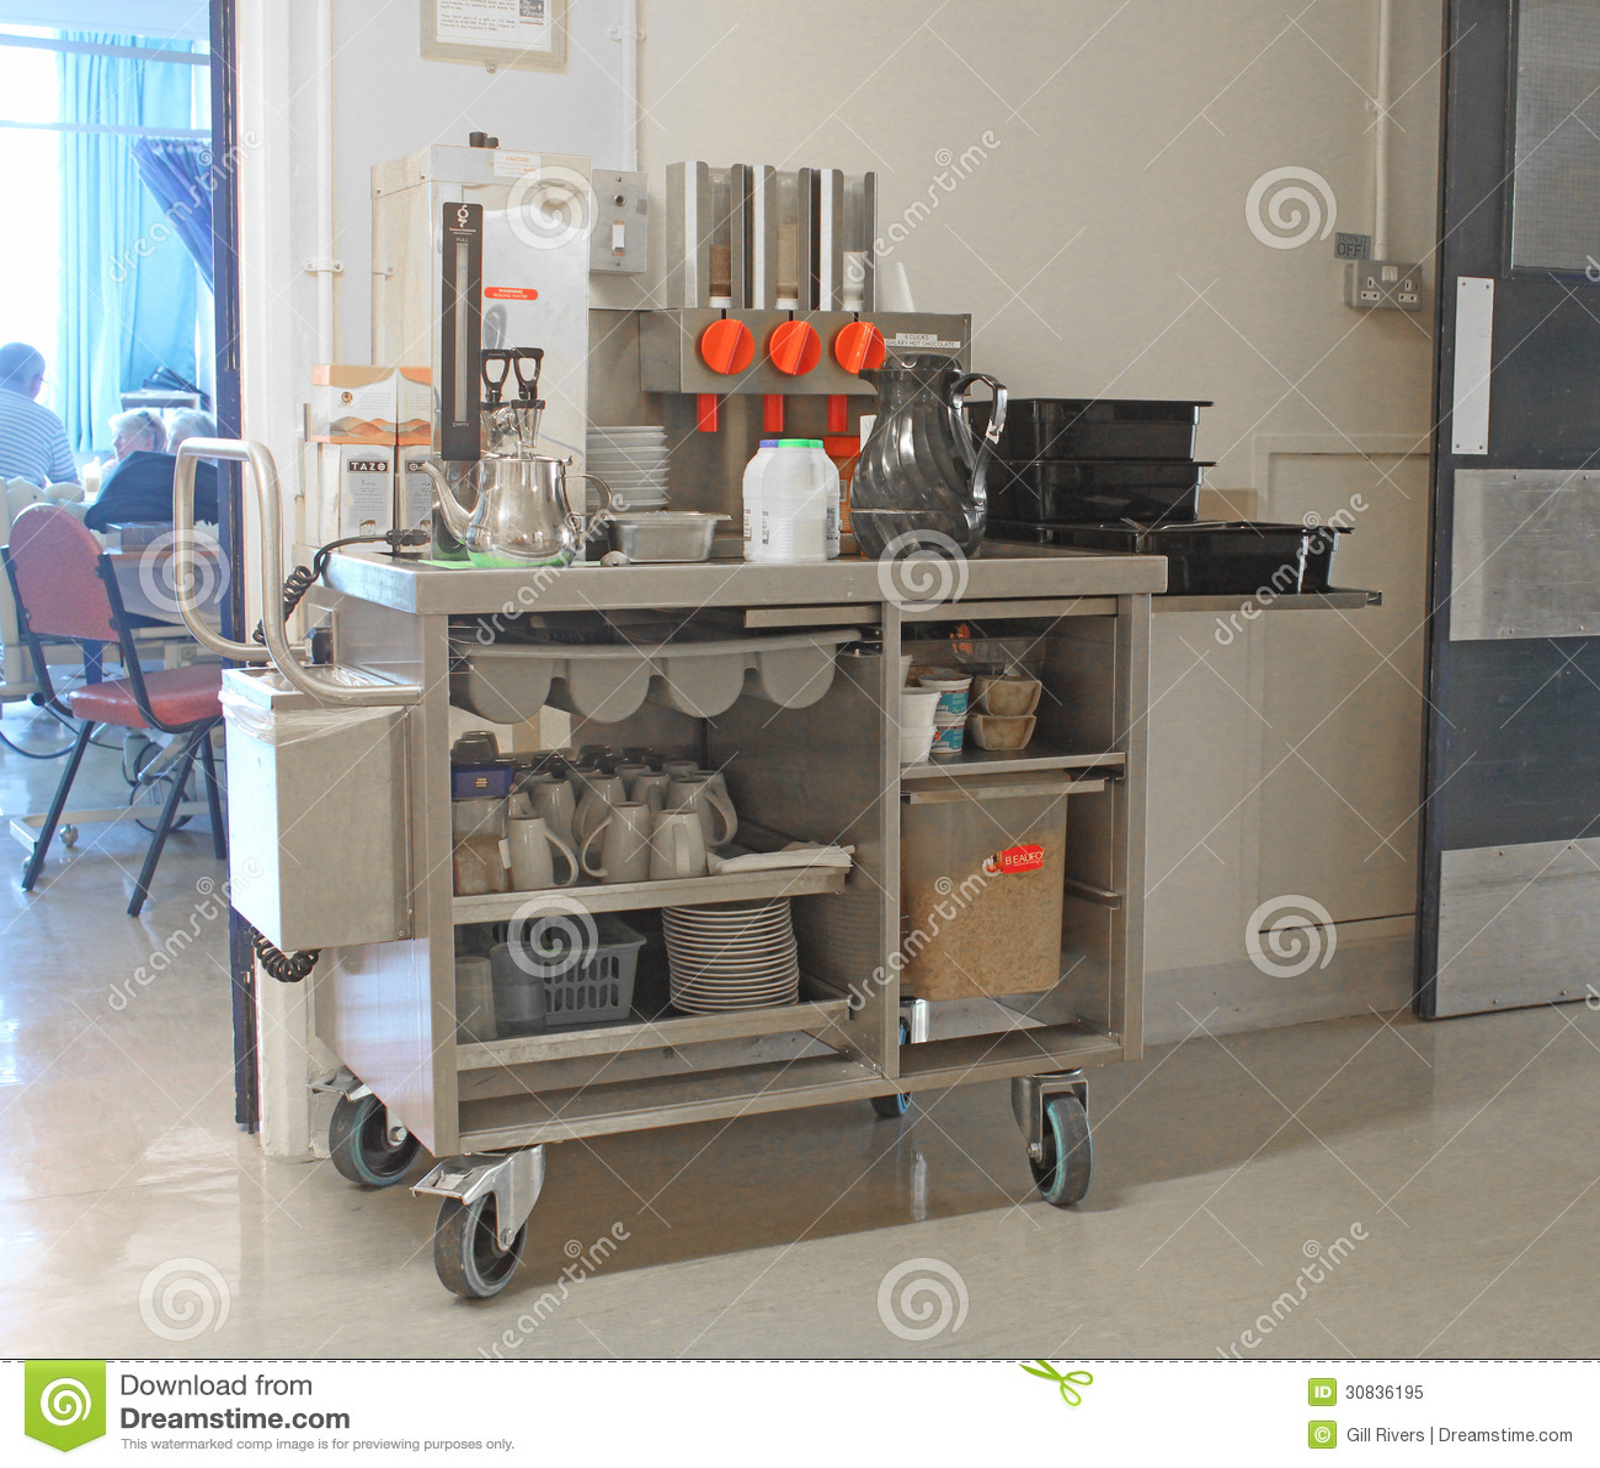 Hospital Tea Trolley editorial image Image of industries 30836195